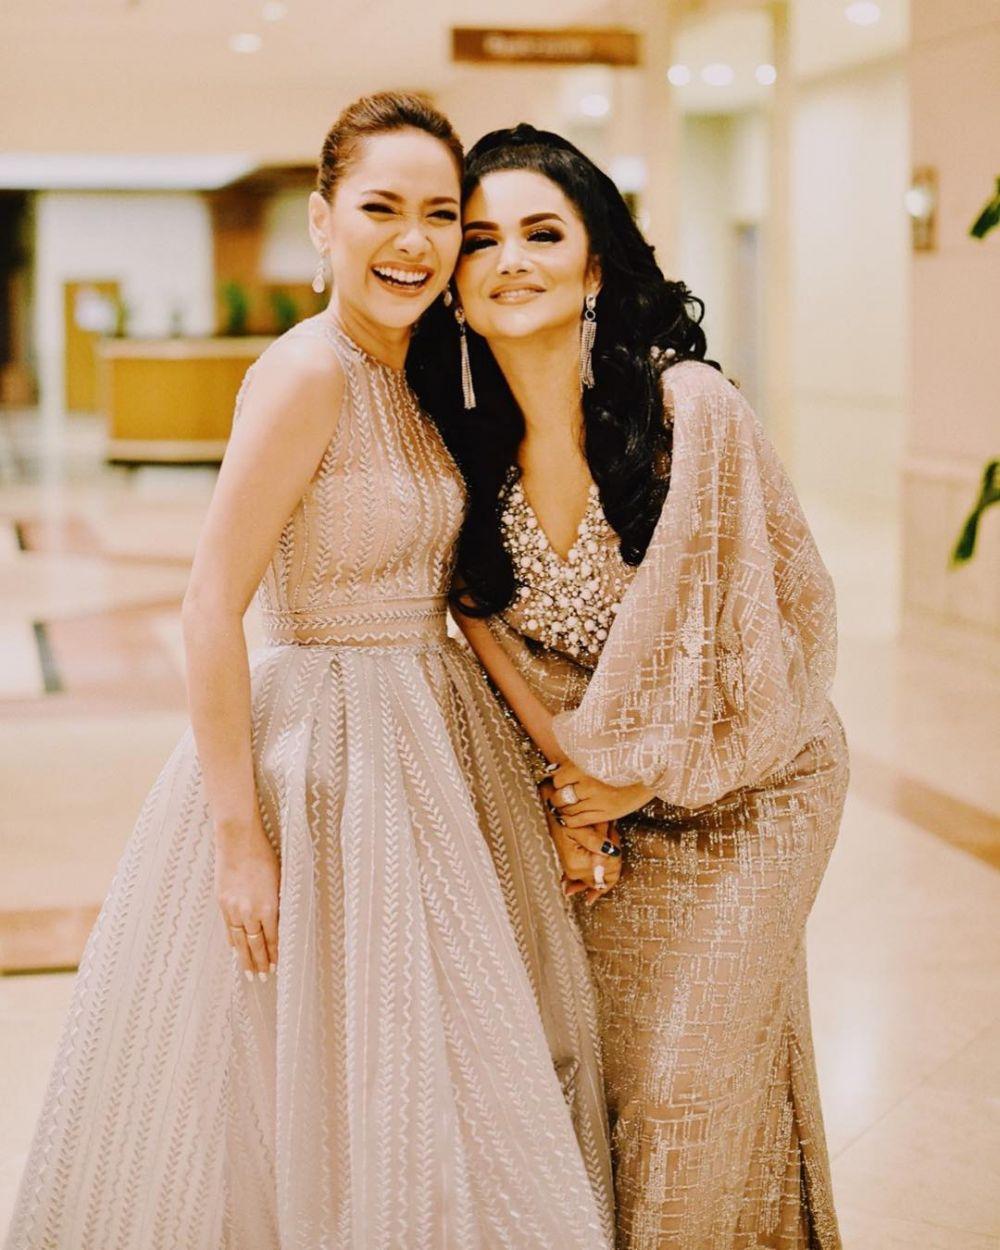 Sahabat, 9 Potret Akrab Bunga Citra Lestari bersama Penyanyi Indonesia